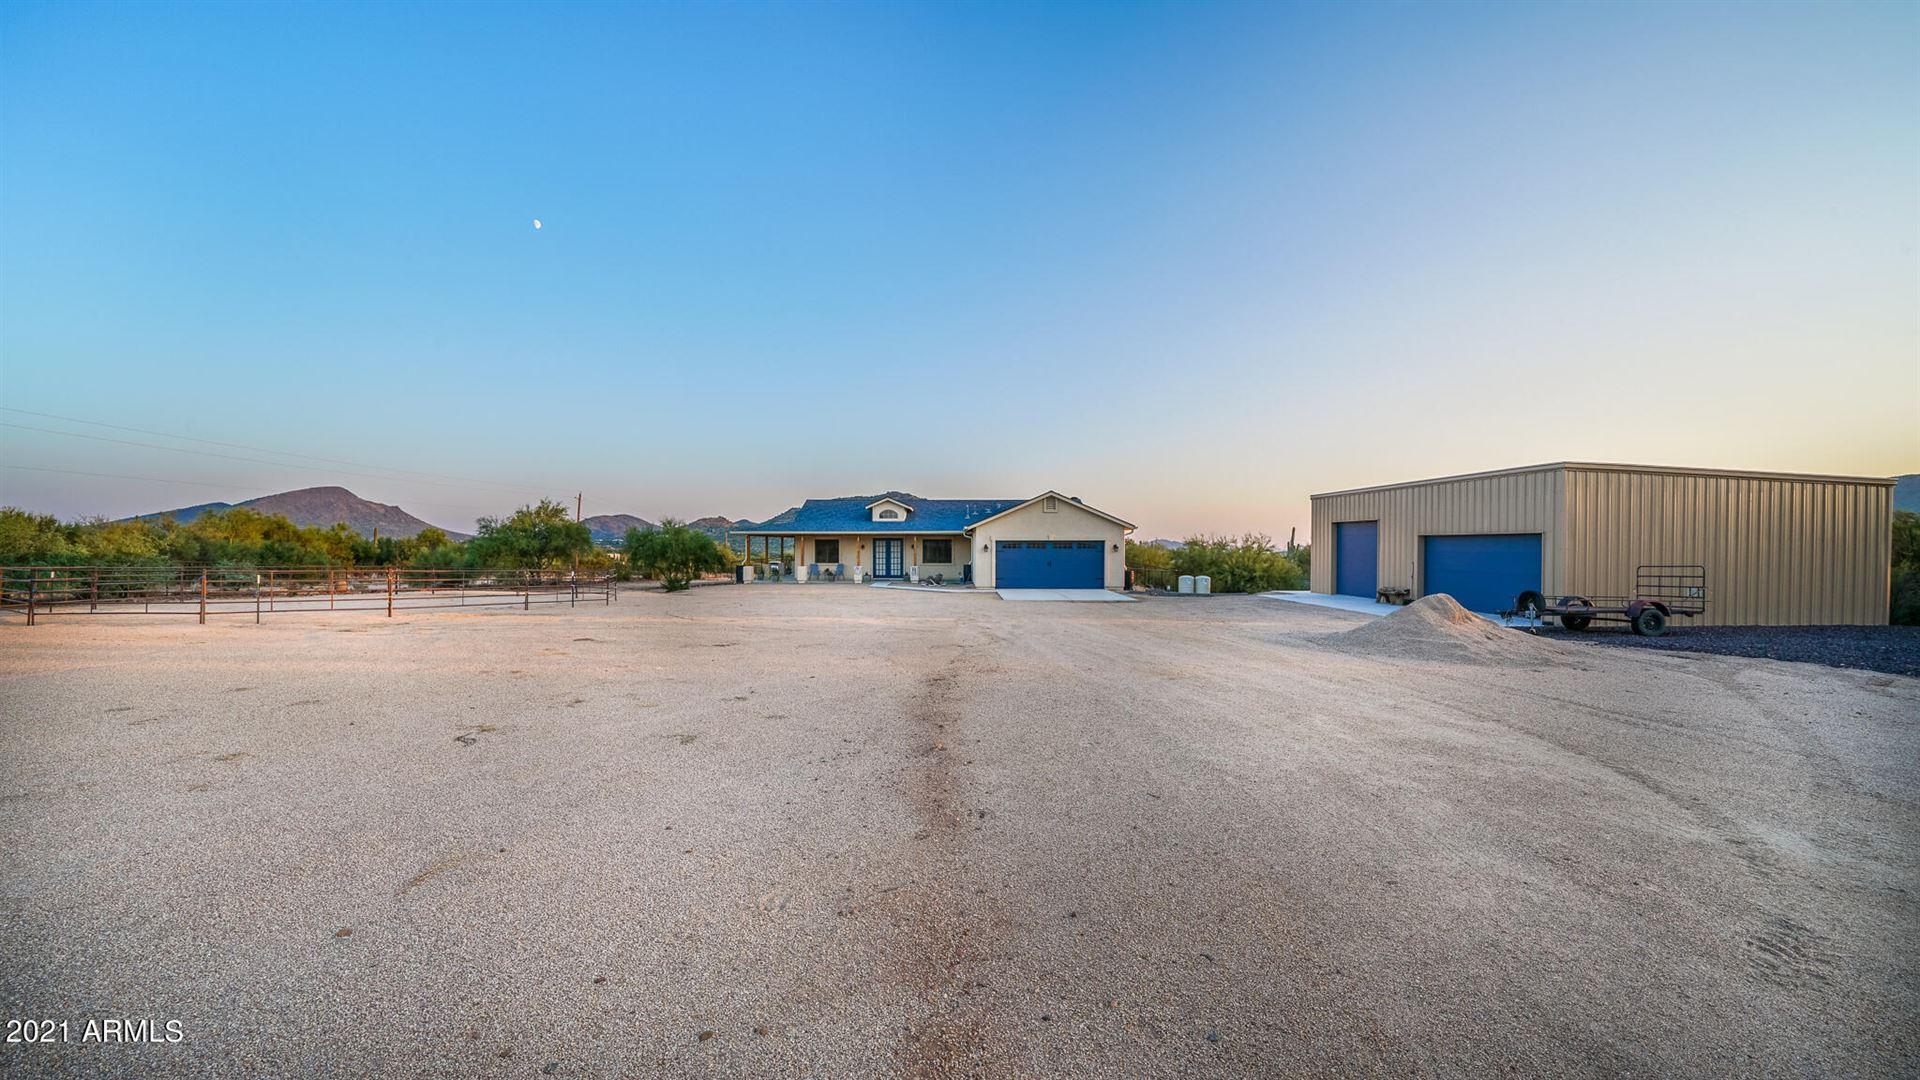 Photo of 411 E VENADO Drive, New River, AZ 85087 (MLS # 6294078)